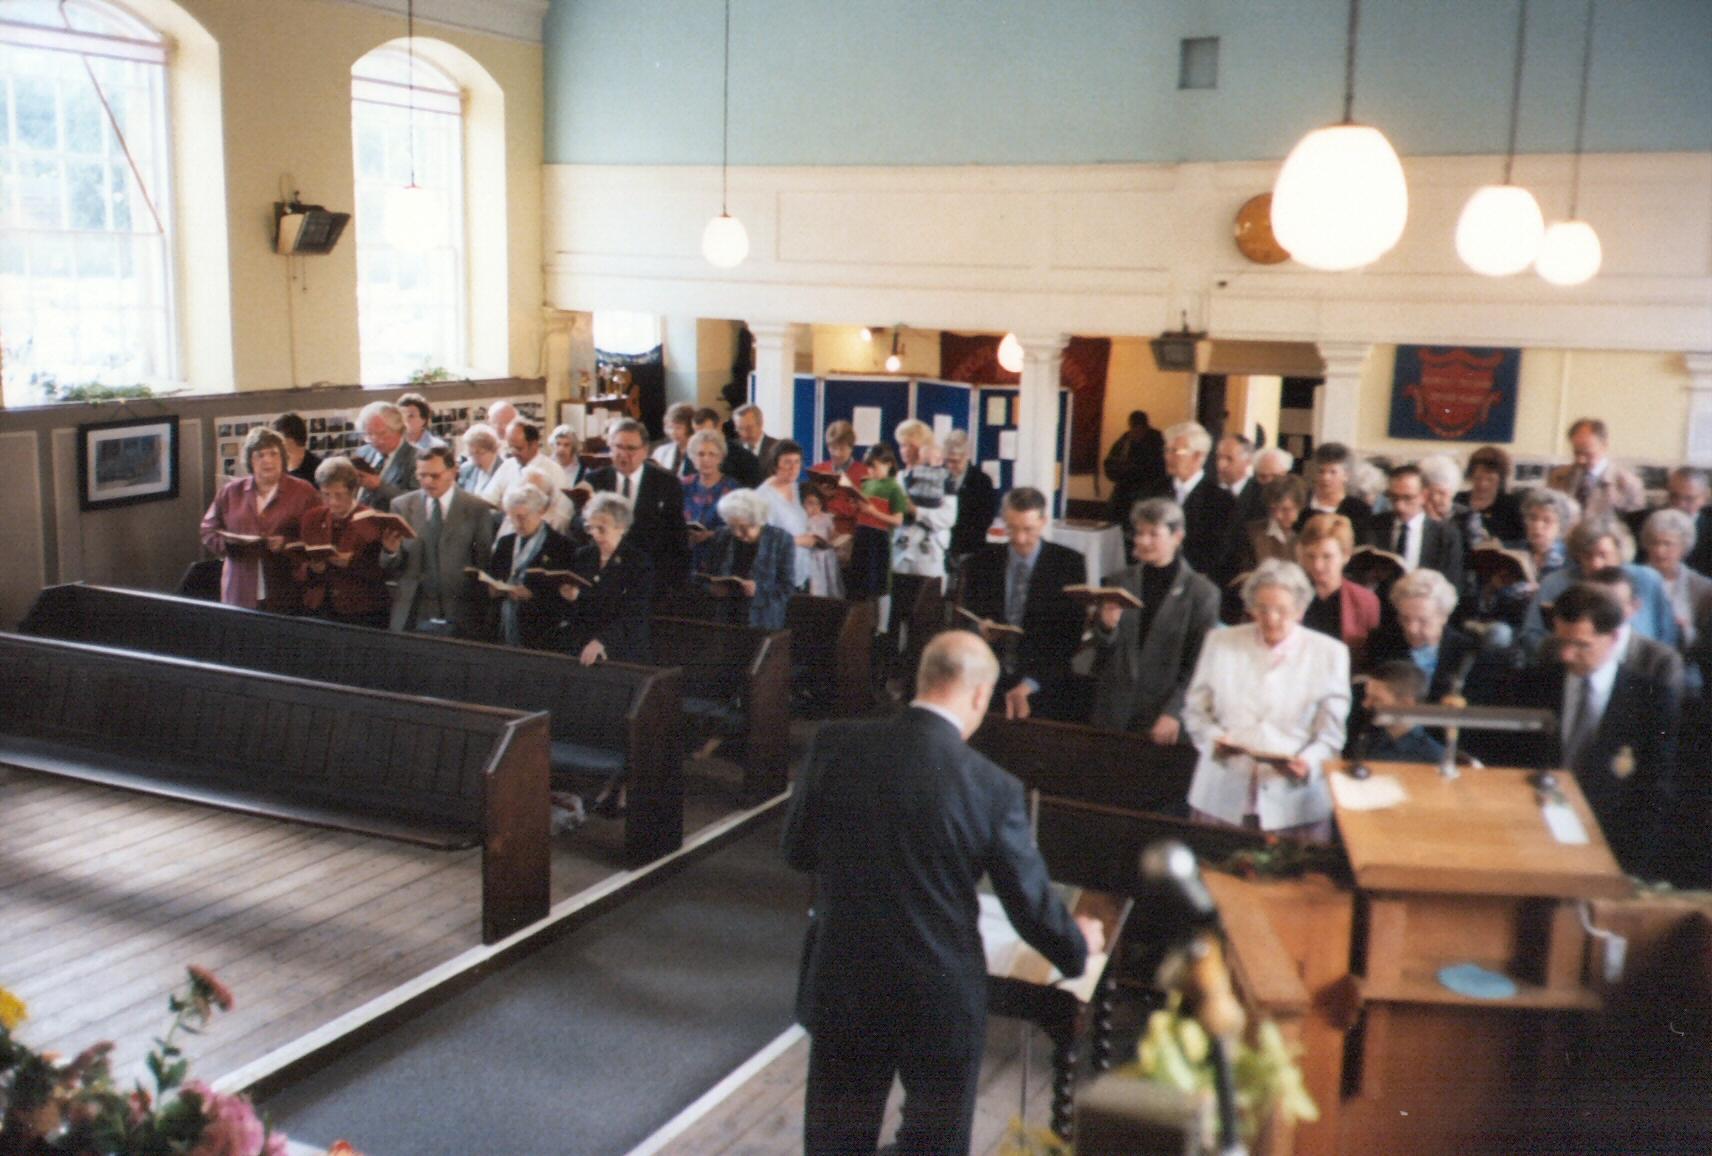 A congregation